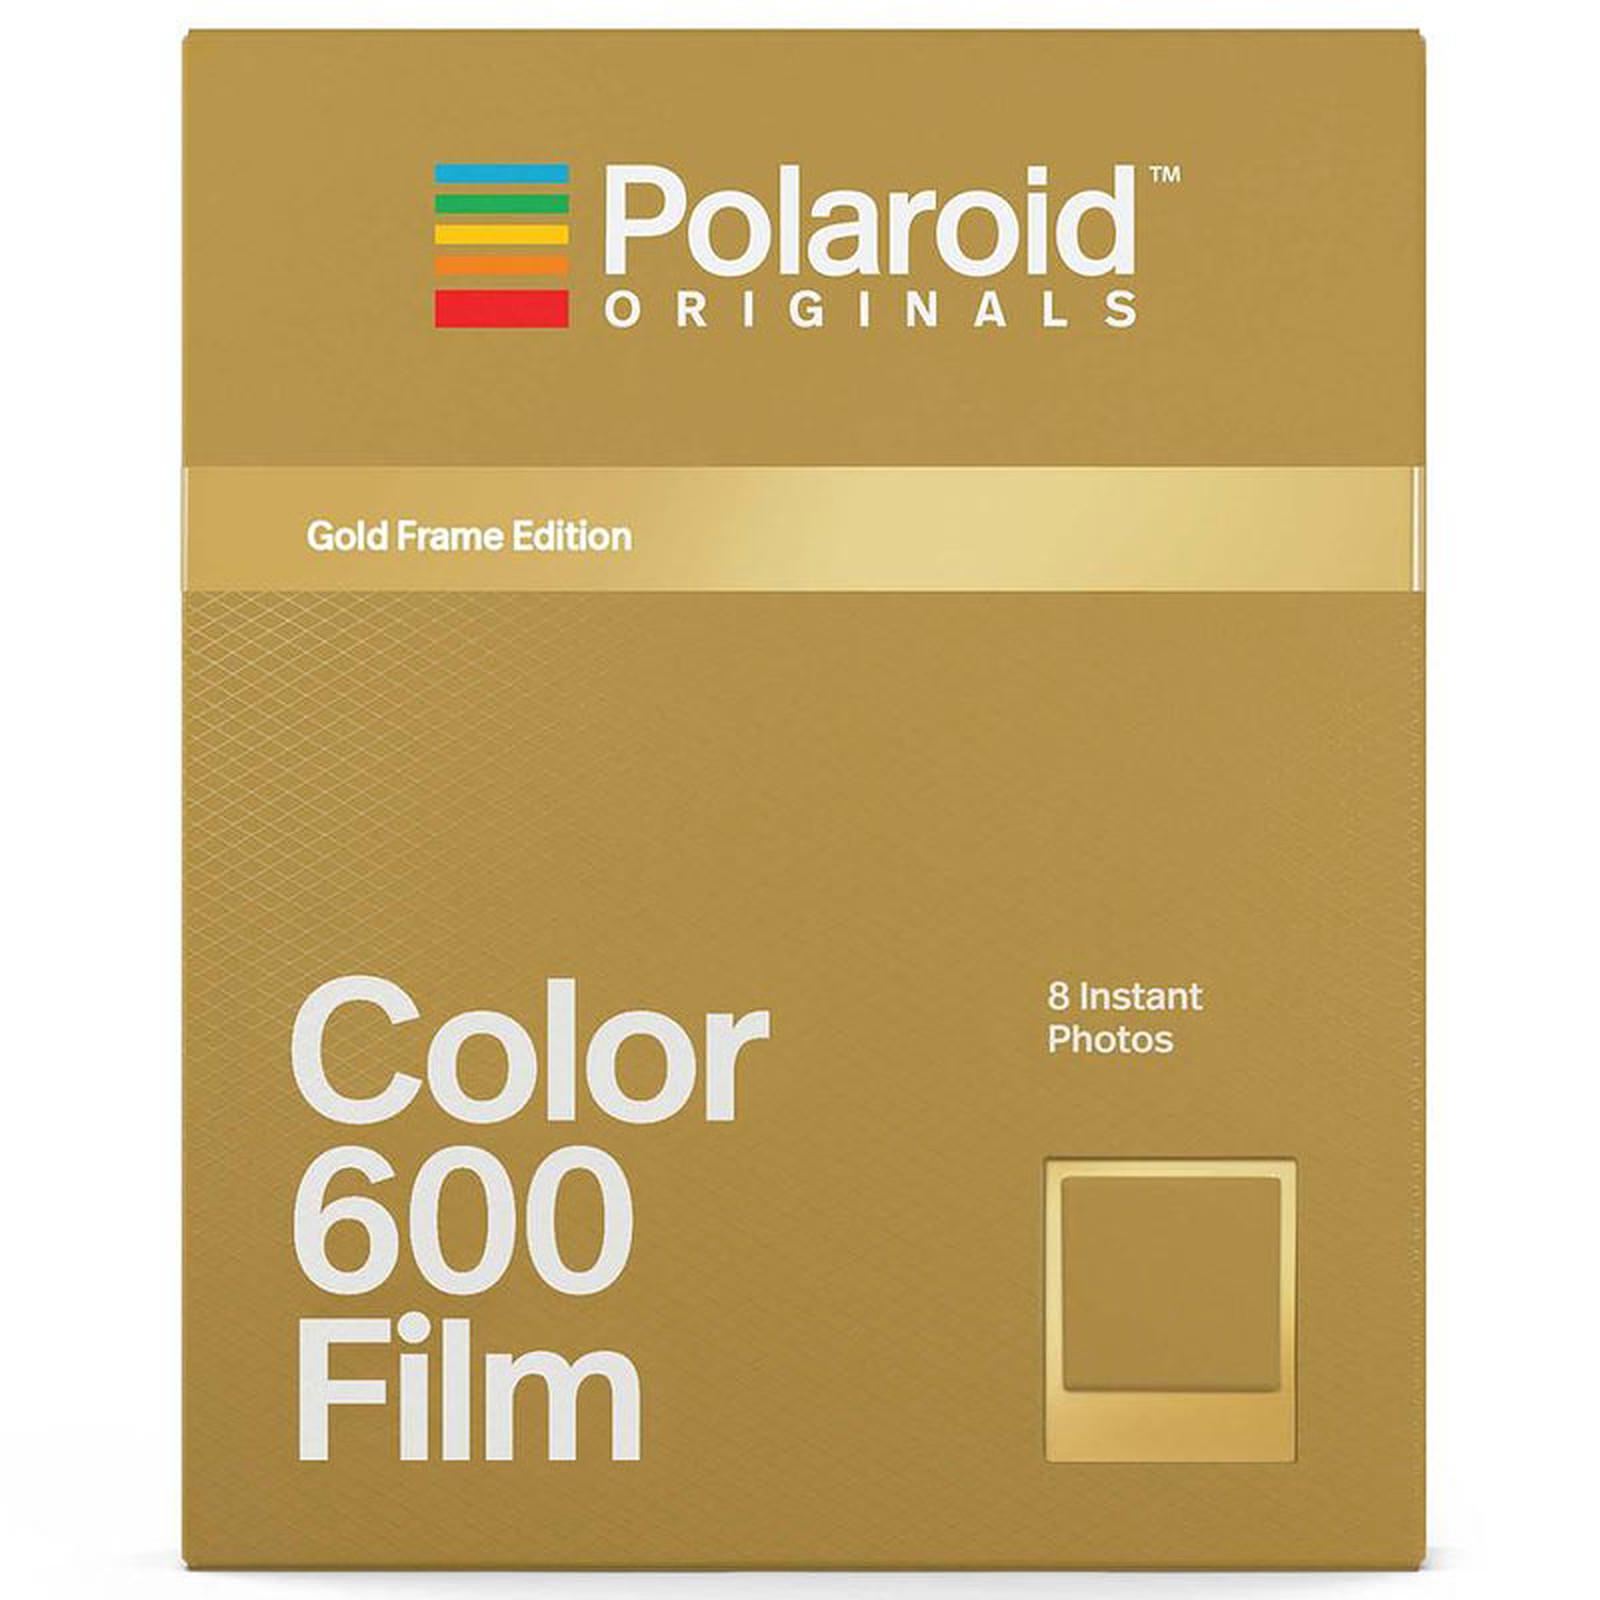 Polaroid Color 600 Film (cadre or)